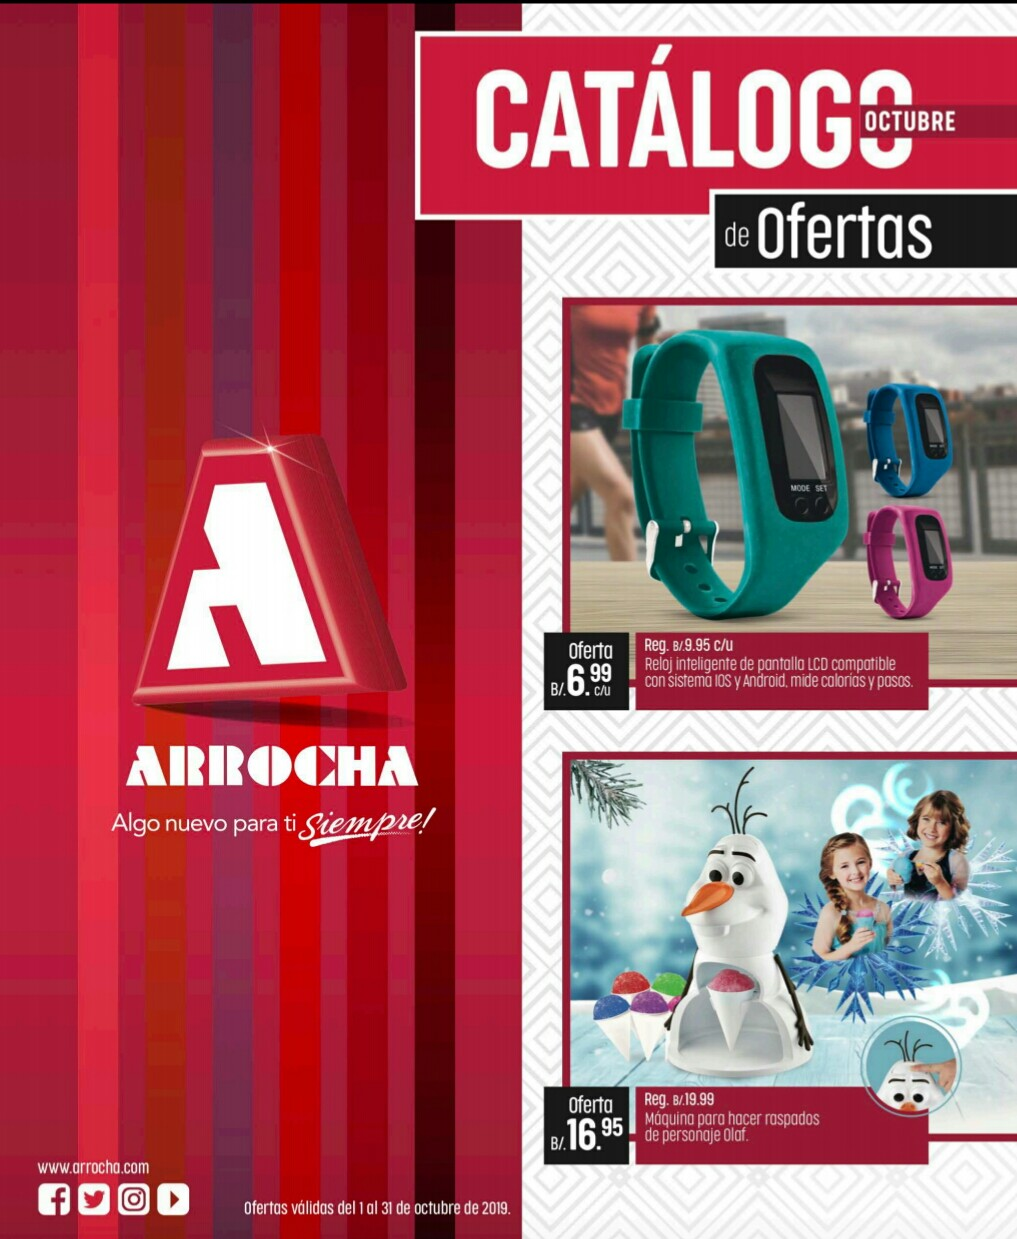 Catalogo Arrocha Octubre 2019 p1